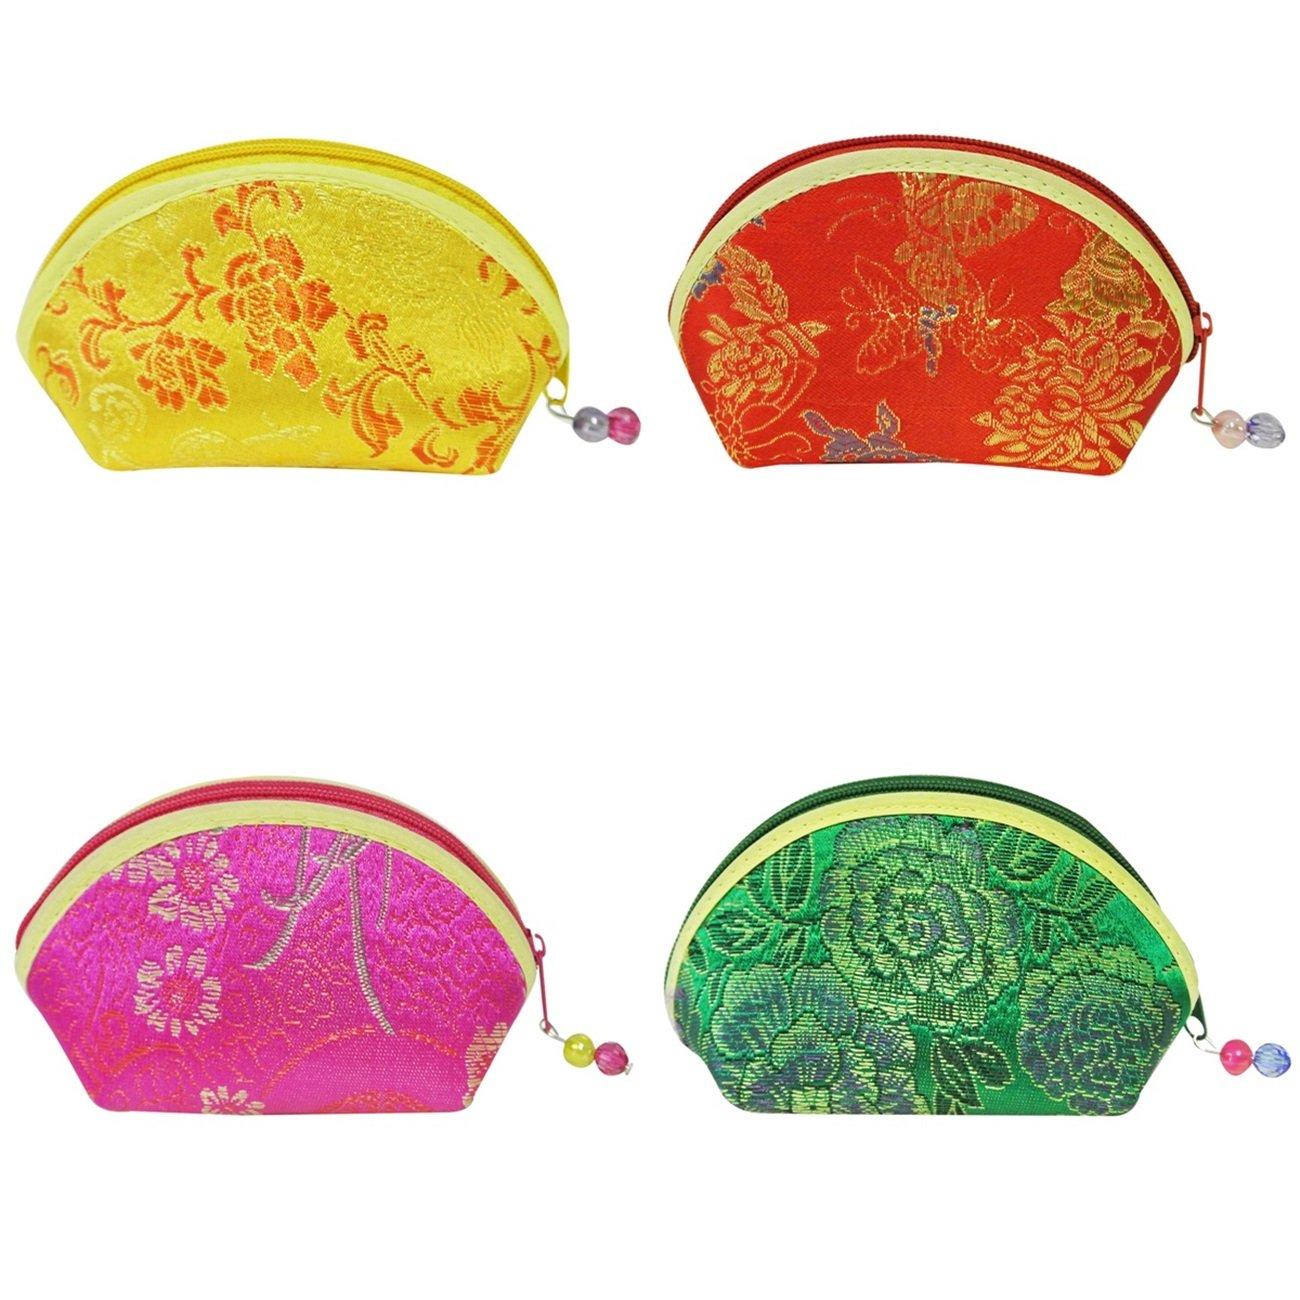 Wrapablesシルク刺繍Brocadeギフトジュエリーコインポーチ財布、イエロー/レッド/ブルー/グリーン、4のセット   B00GBKXXJ8